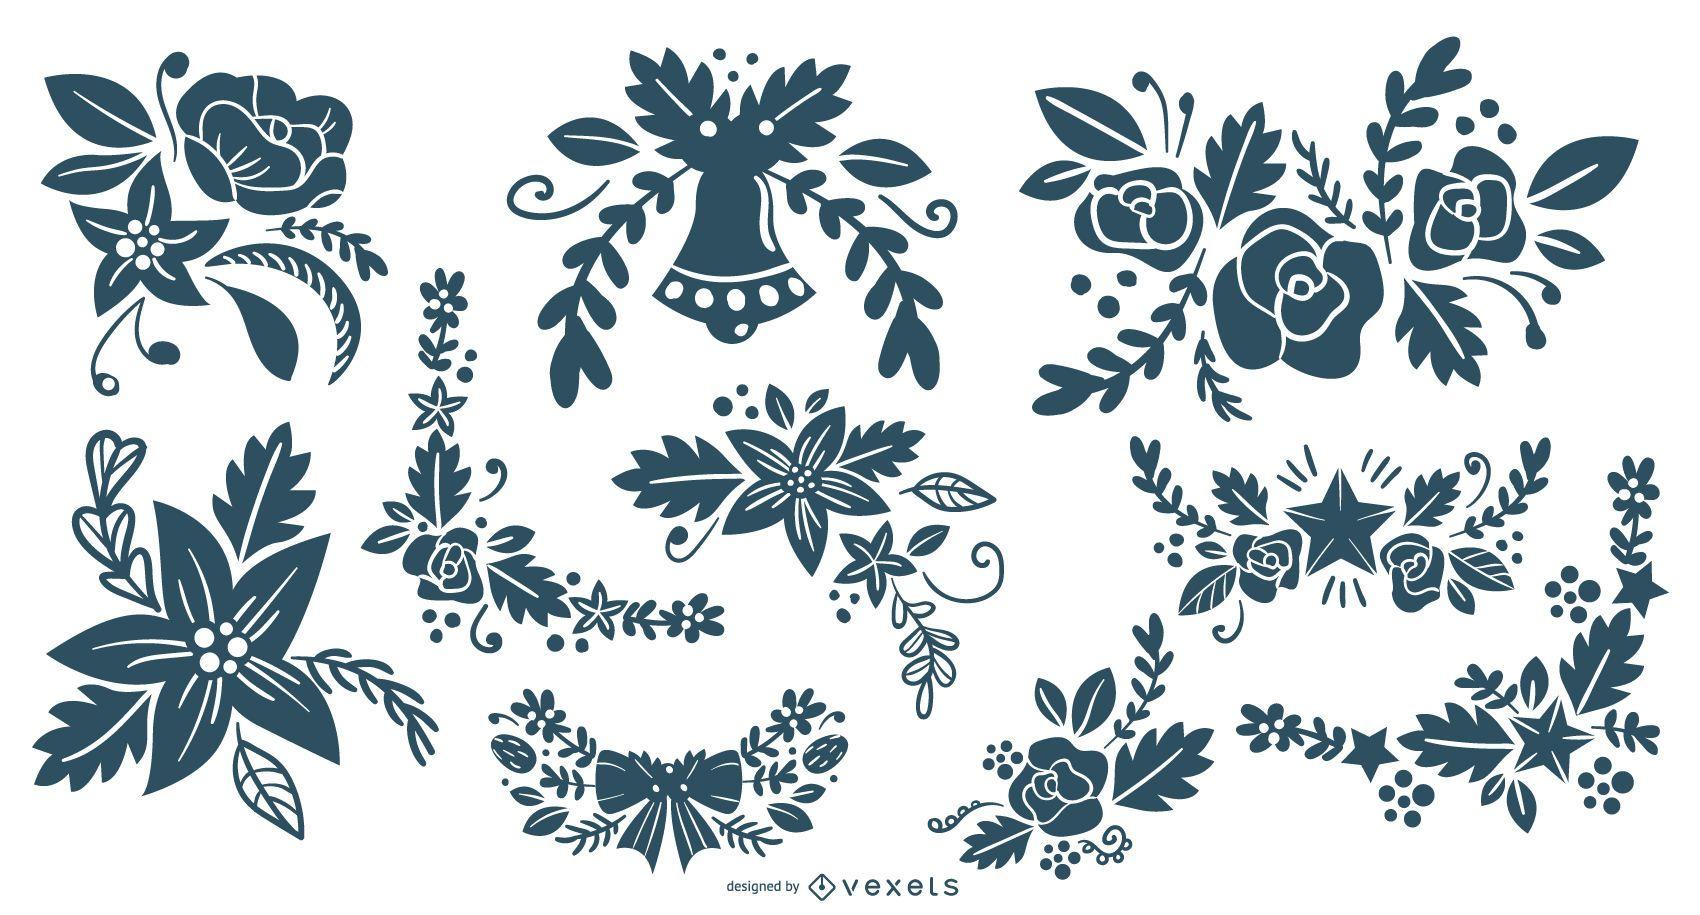 Colección de silueta de adornos florales navideños